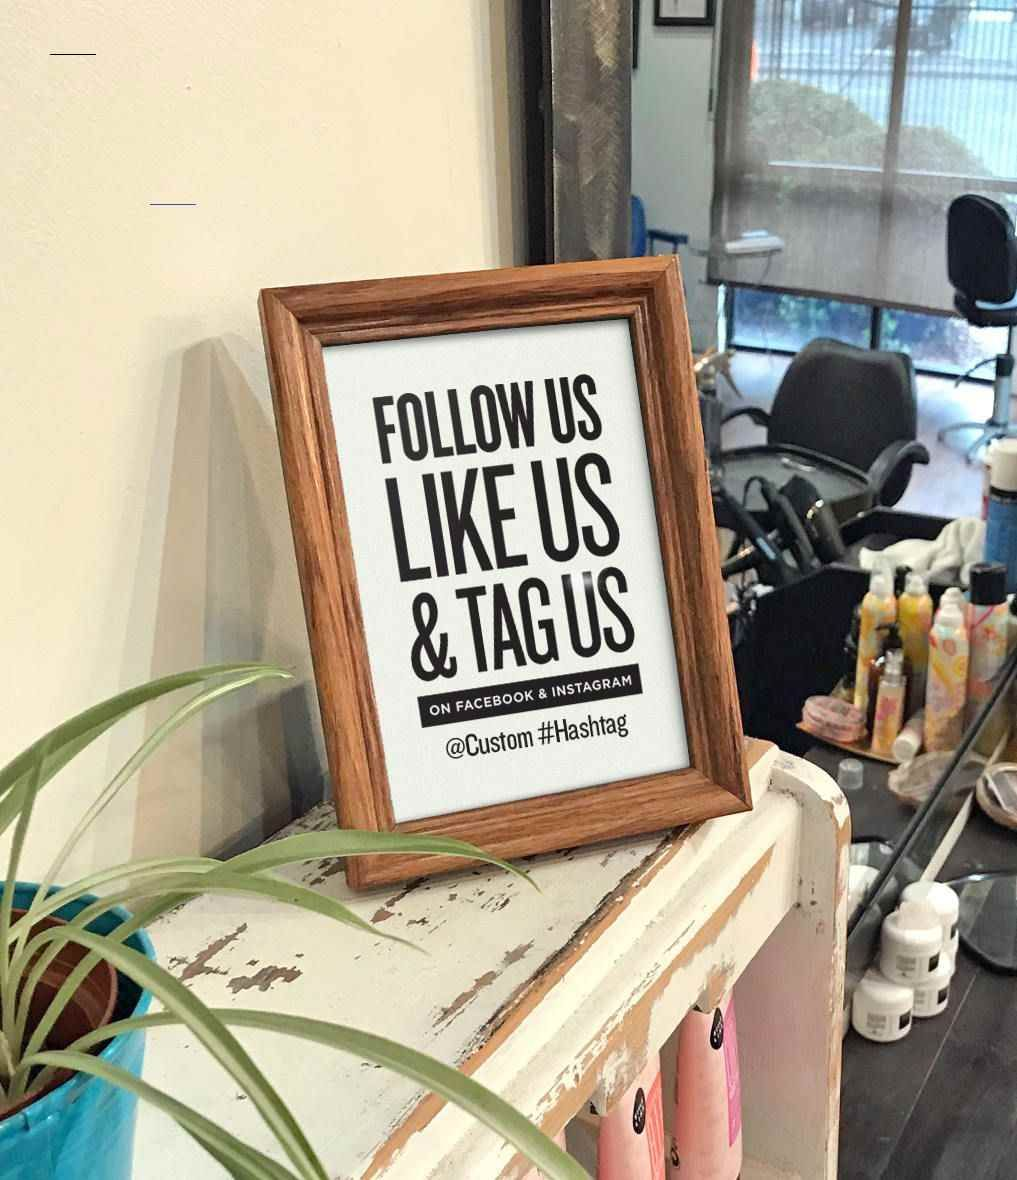 Follow Us Like Us Tag Us On Facebook And Instagram With Custom Text Social Media Call To Kapsalon Ideeën Schoonheidssalon Interieur Salon Interieur Ontwerp